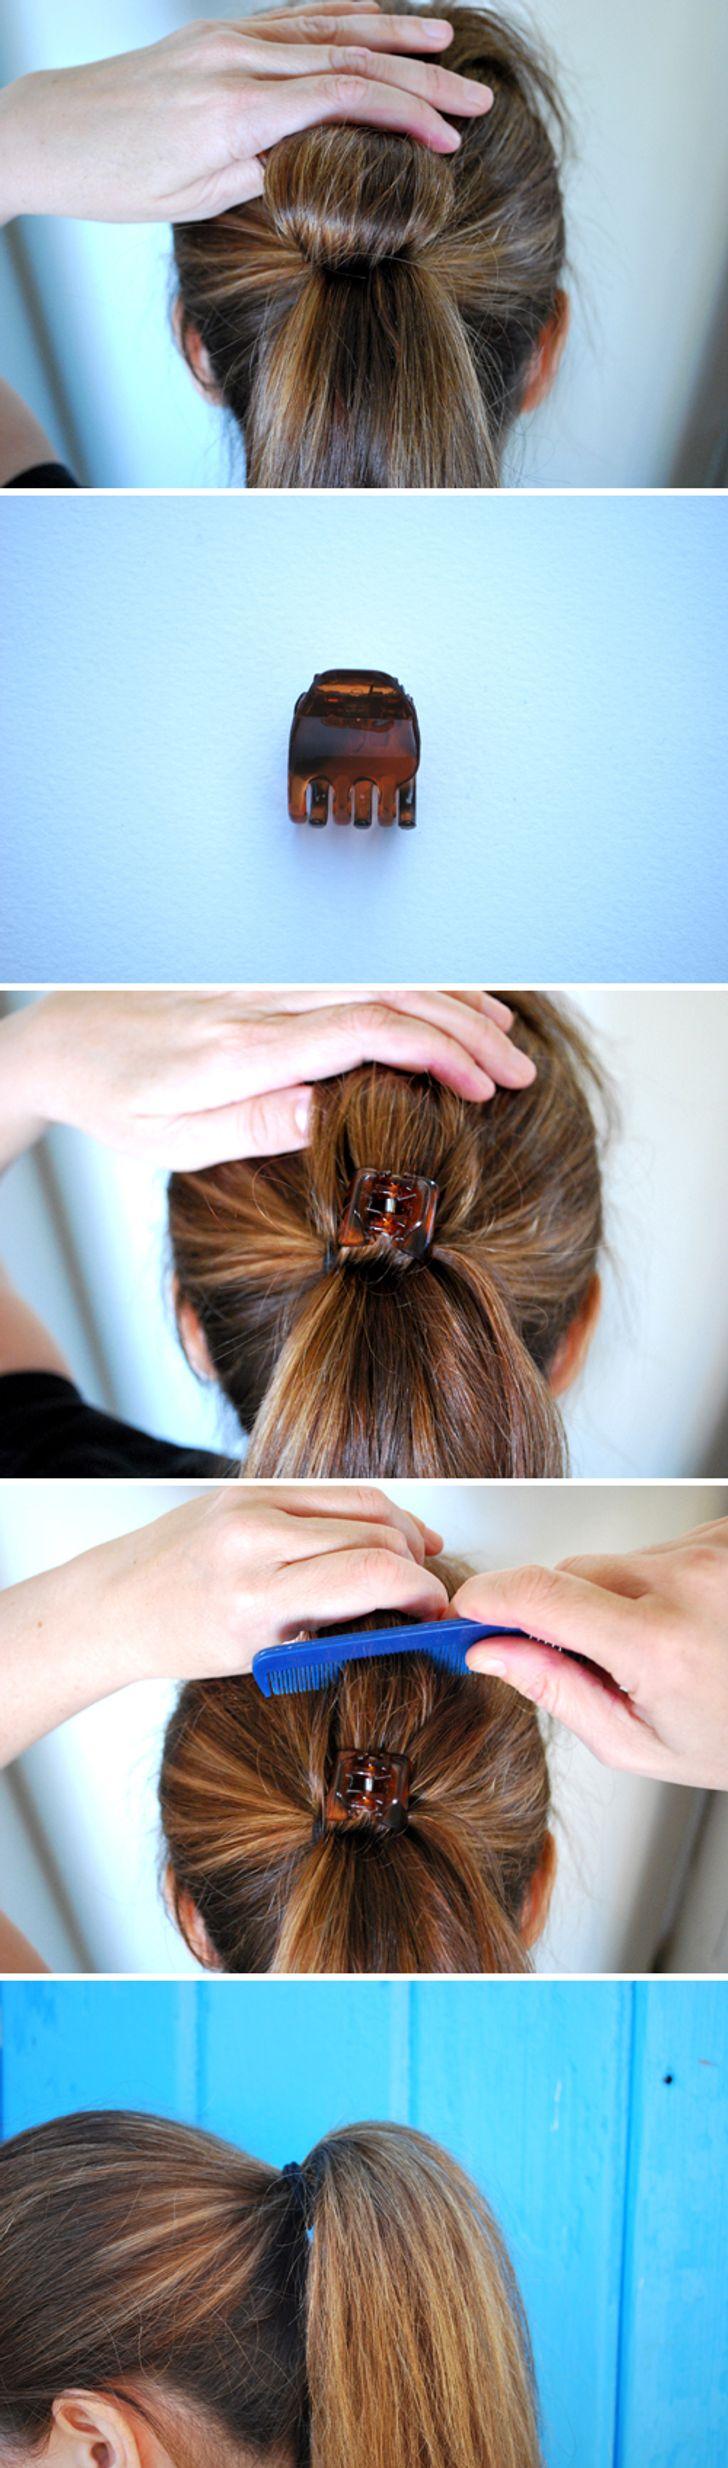 queue-de-cheval-coiffure-simple-et-rapide